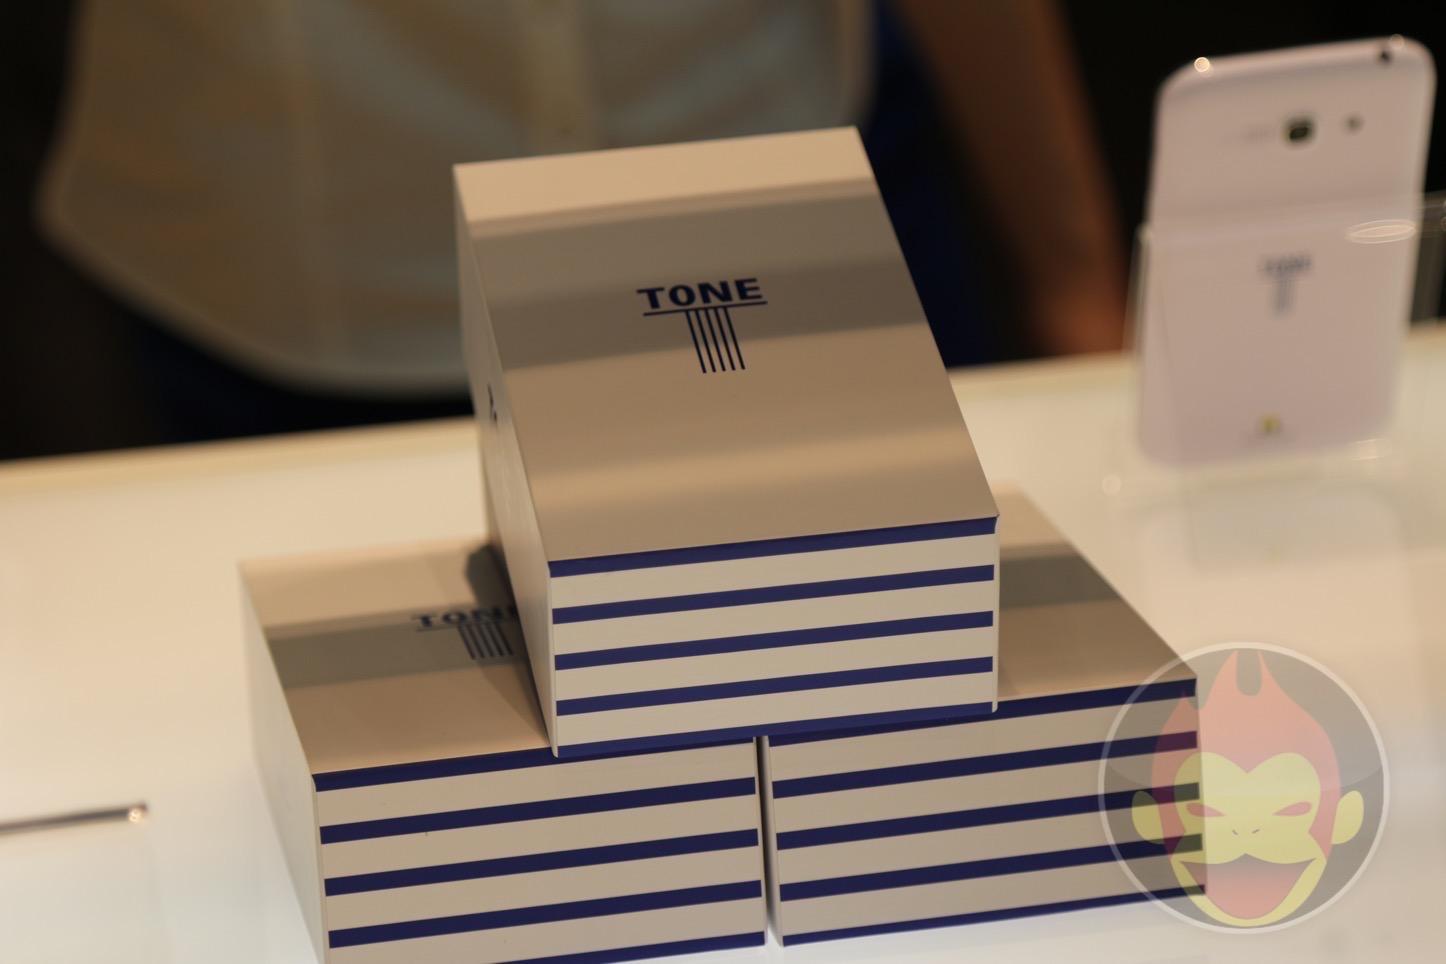 Tone-Mobile-006.JPG